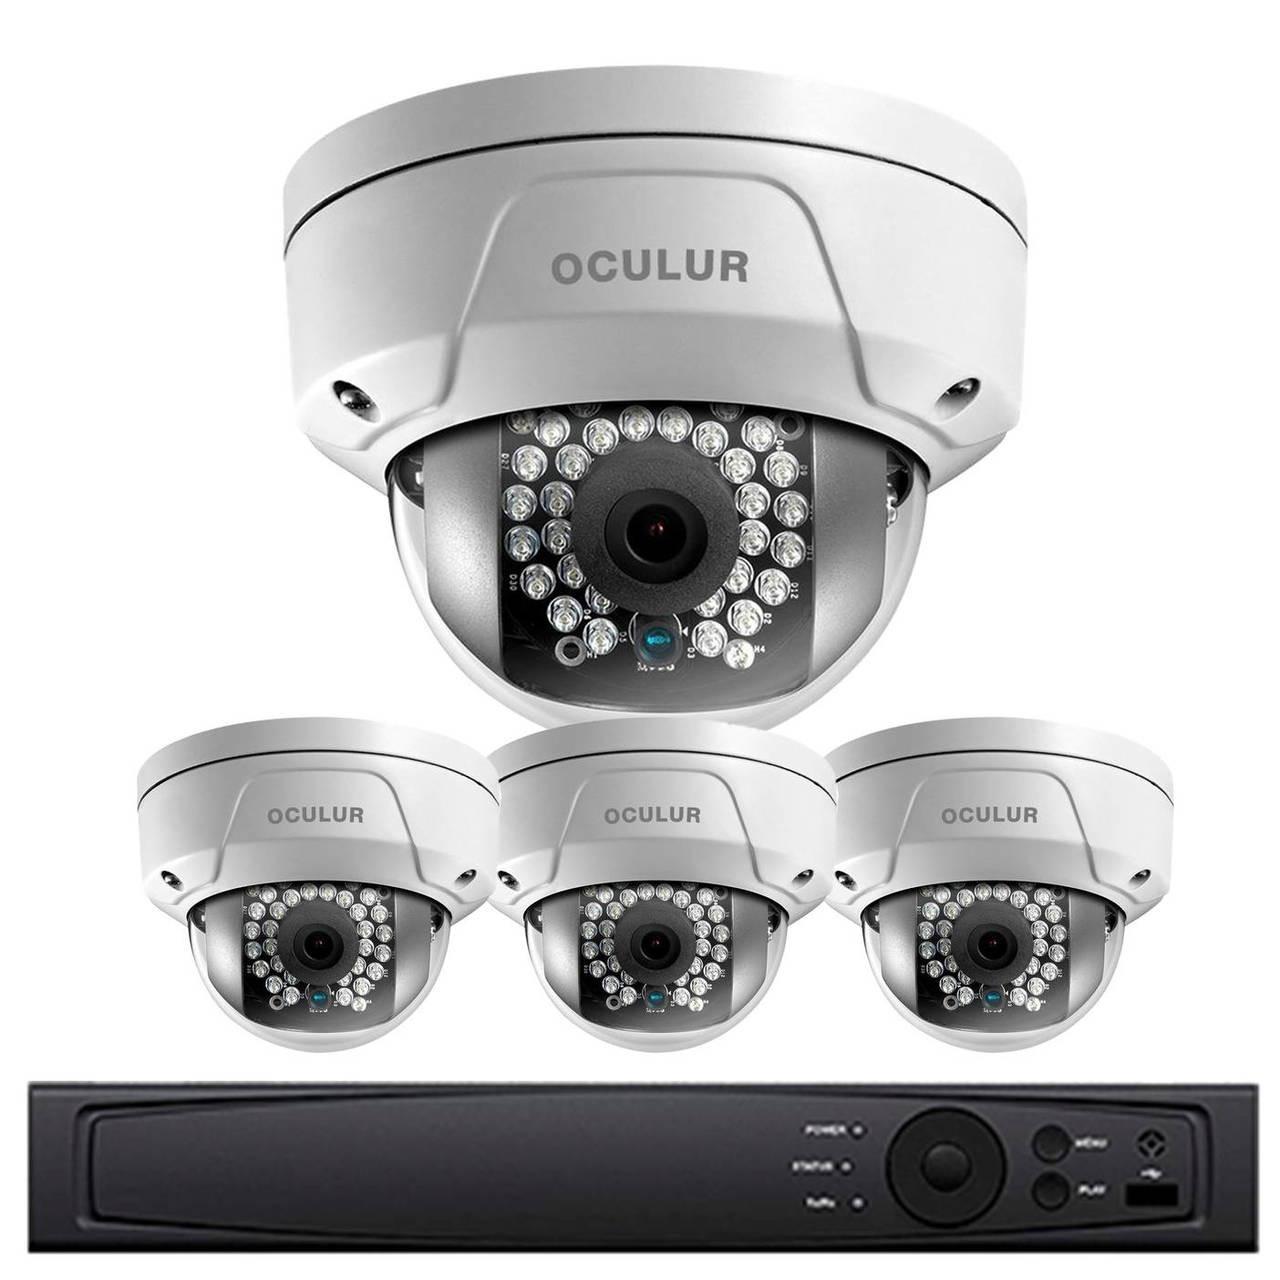 Security Video Camera Anti Theft Vandal Device Surveillance System